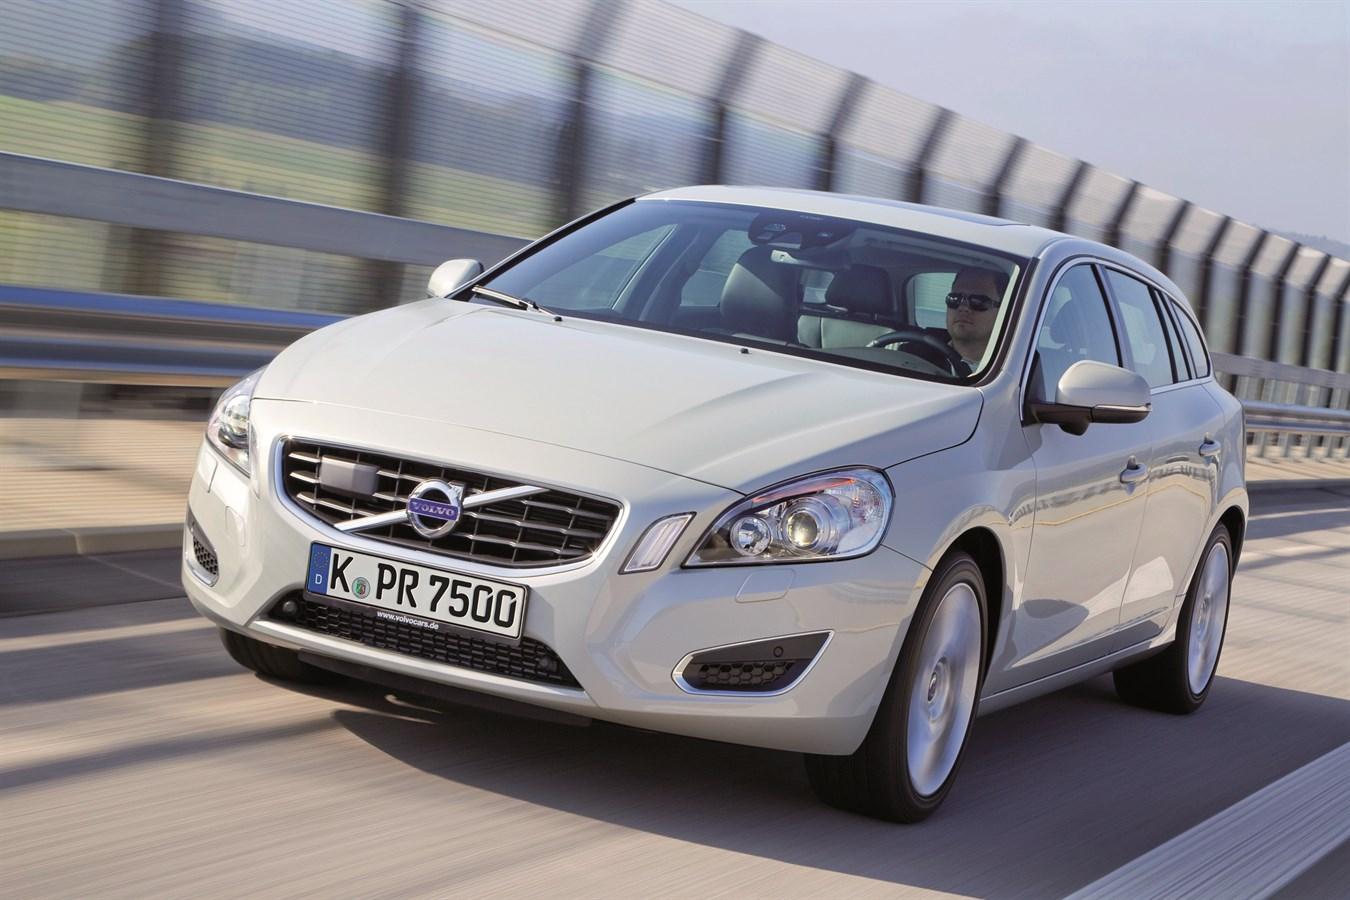 volvo car corporation 39 s emergency brake assist wins in adac comparison test volvo car group. Black Bedroom Furniture Sets. Home Design Ideas